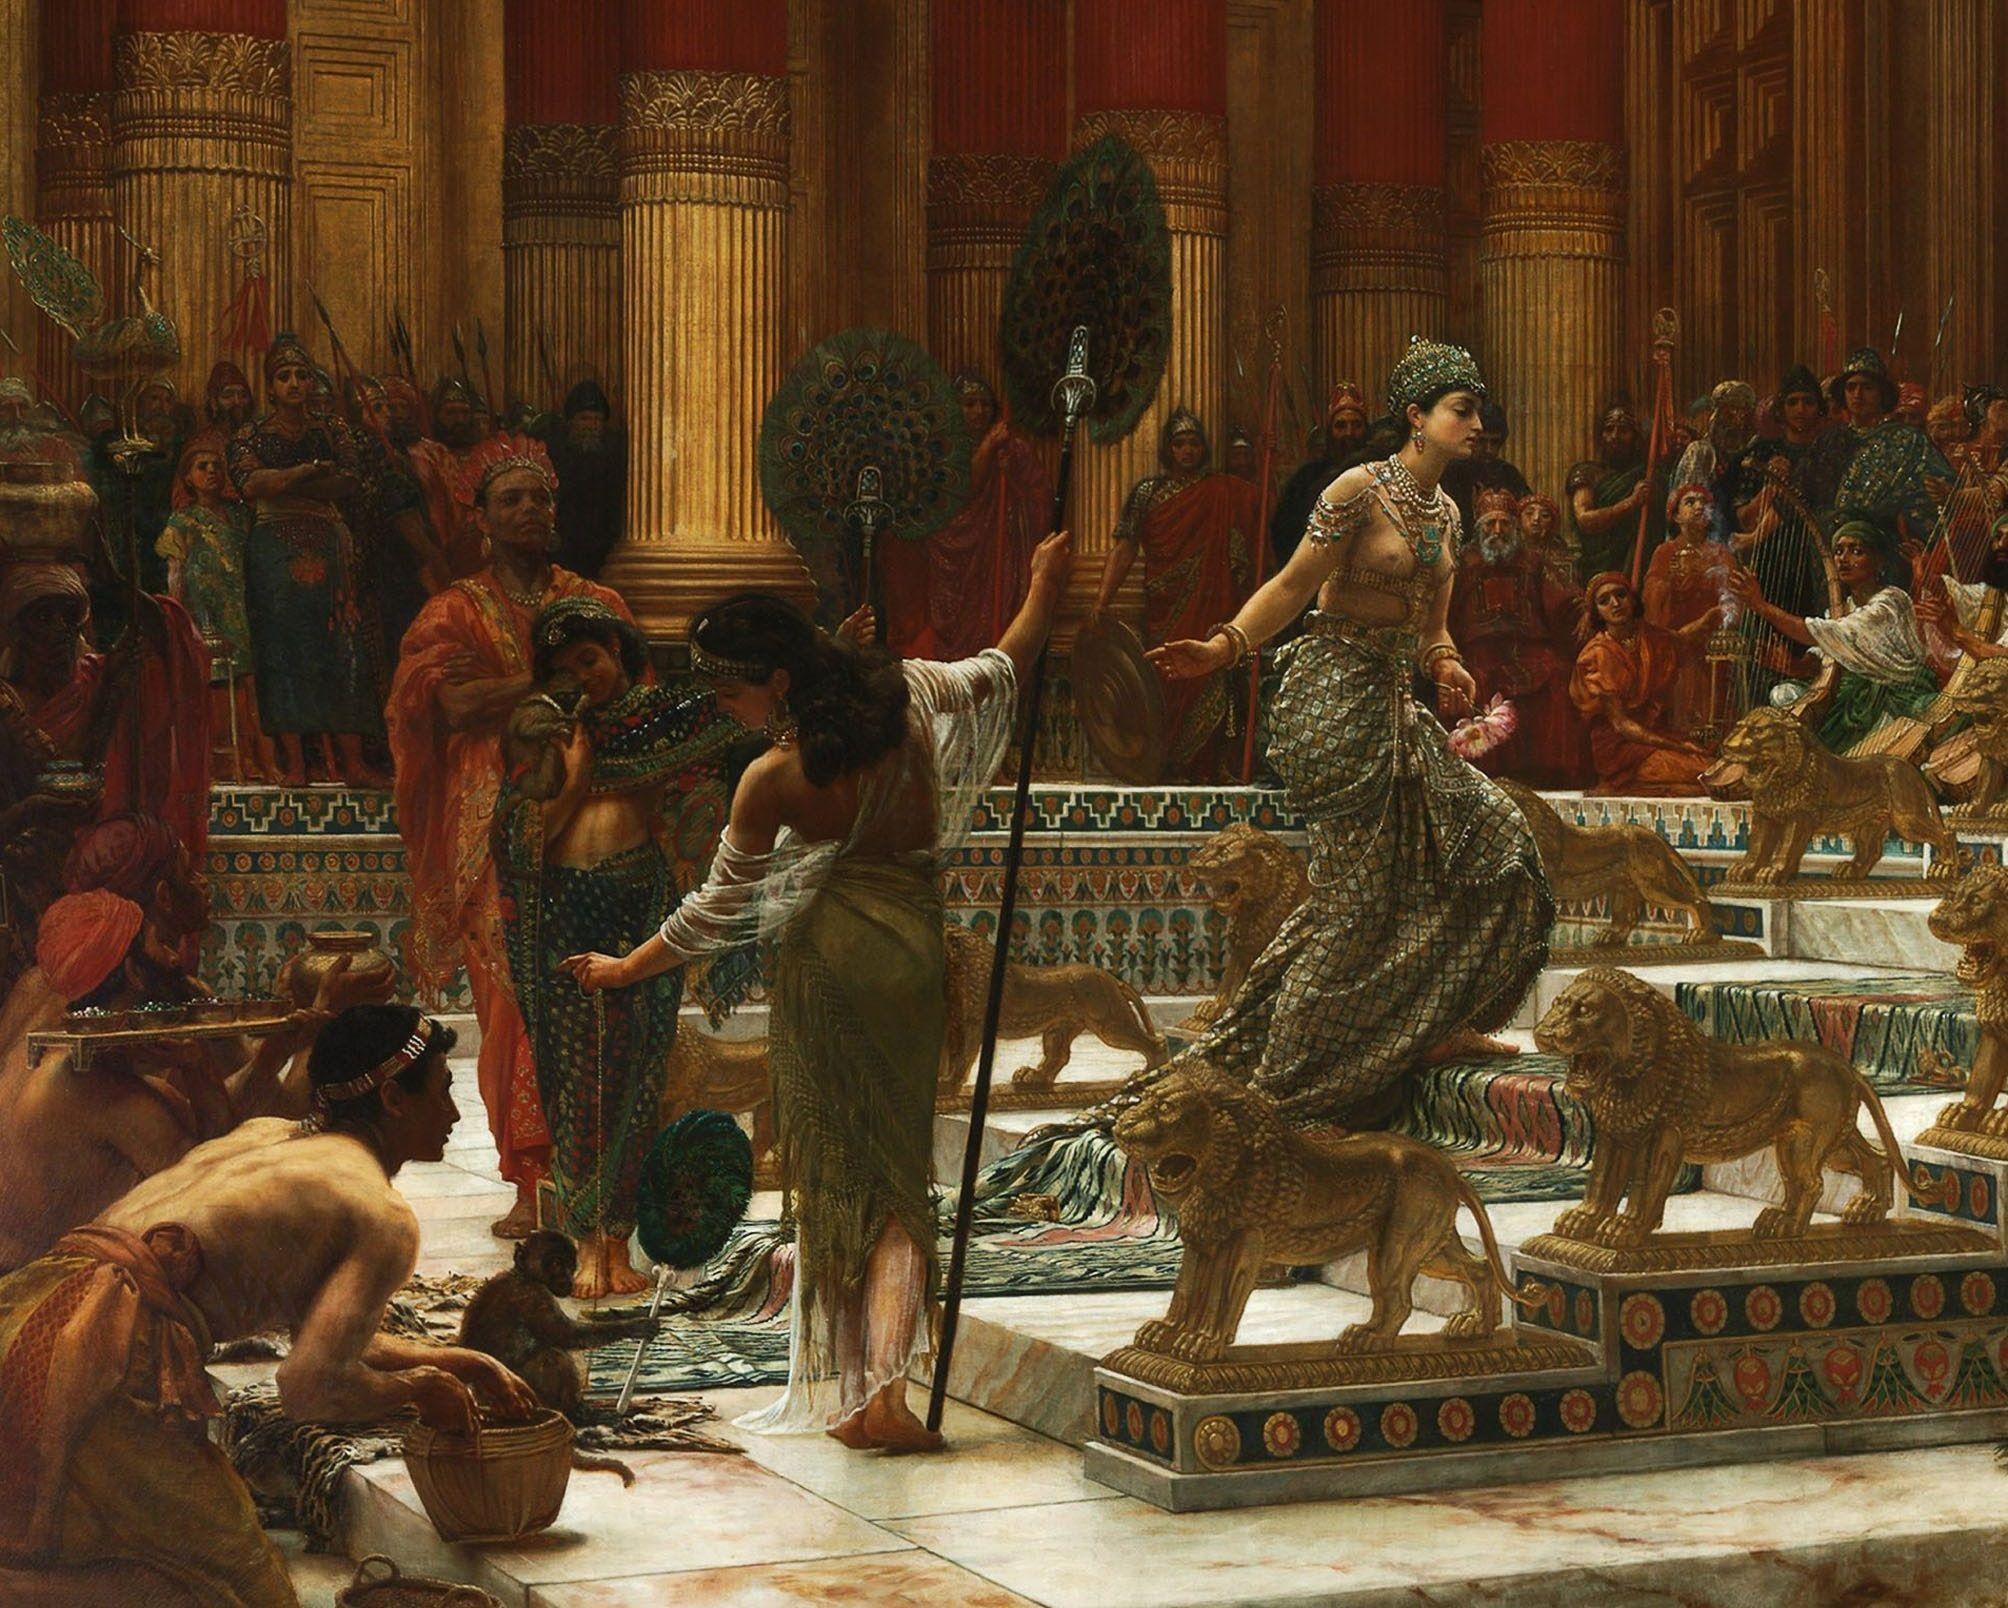 Sir Edward John Poynter 1890 The Visit Of The Queen Of Sheba To